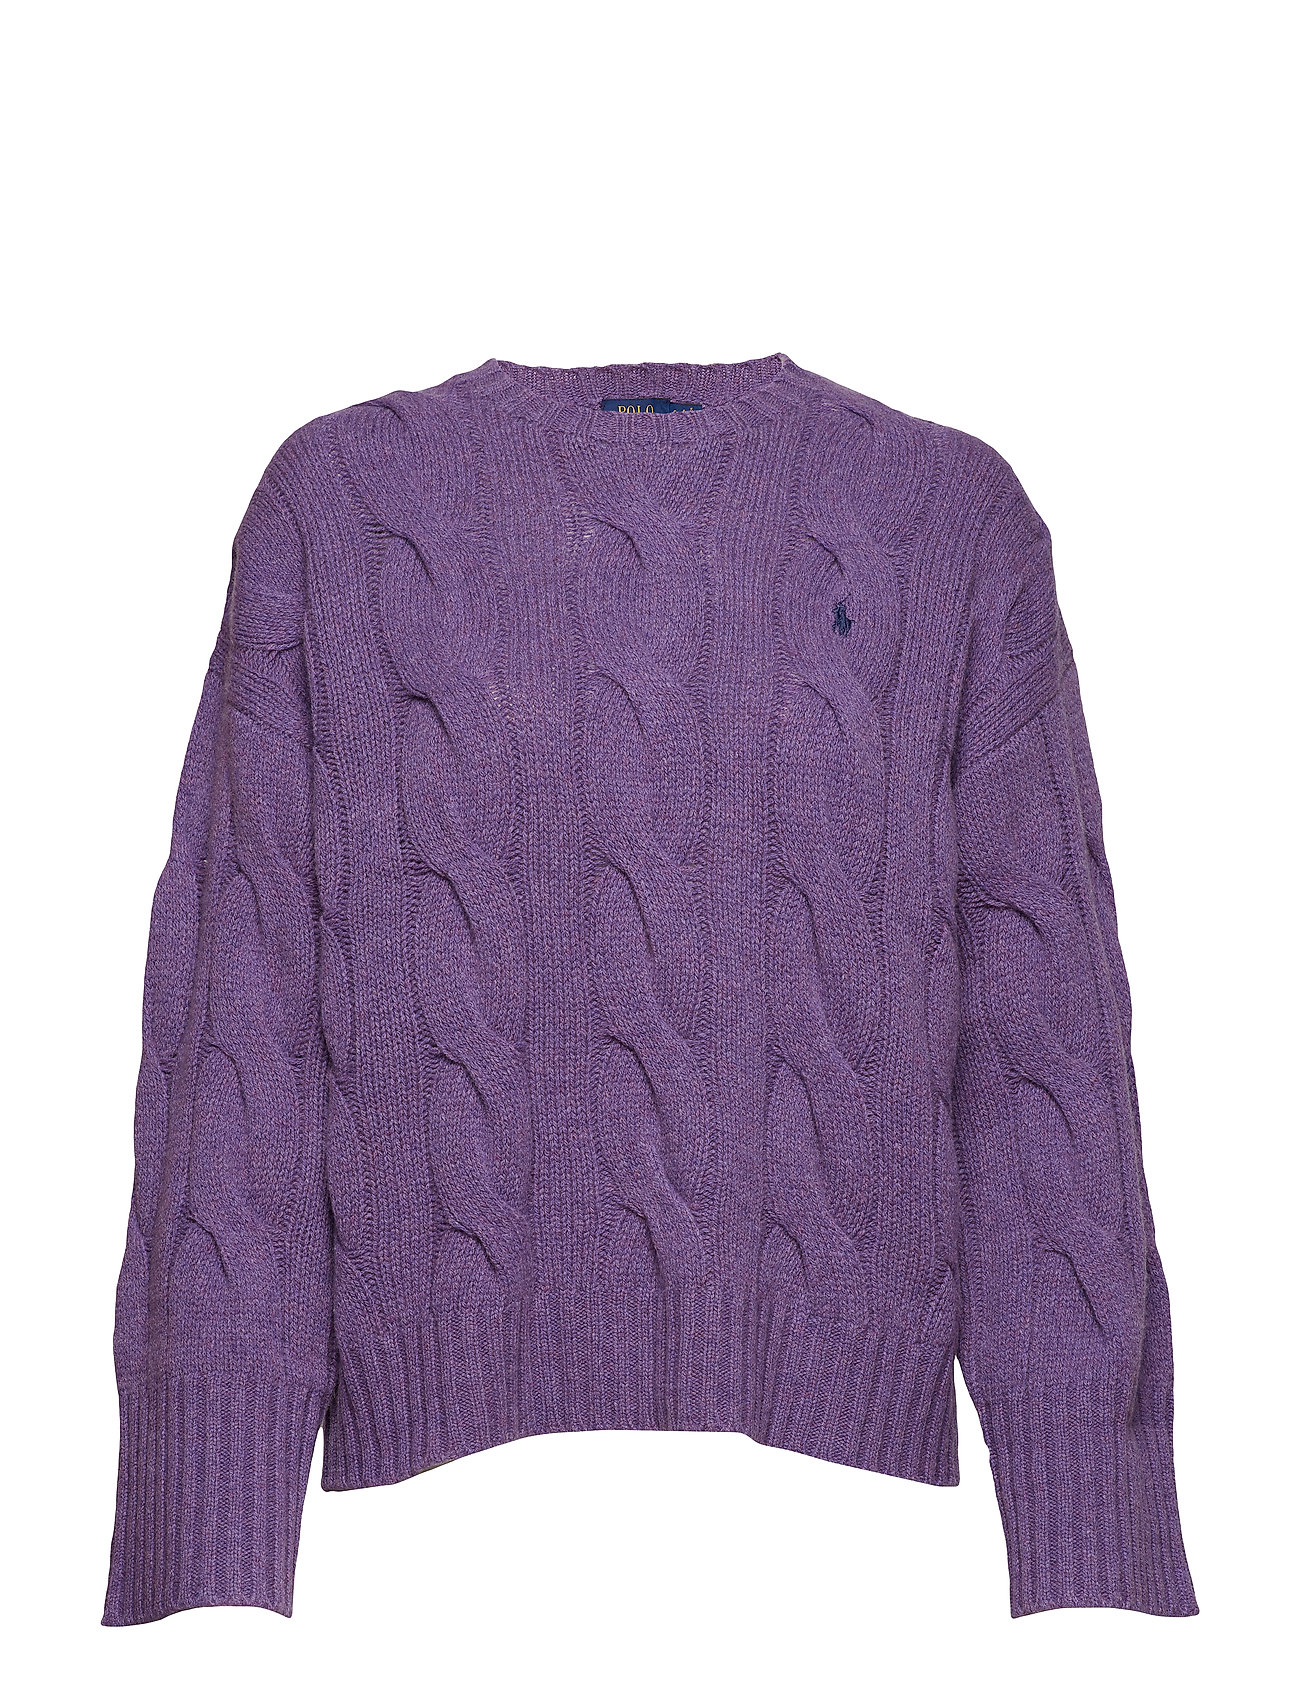 Wool HeathPolo Sweaterthistledown Ralph Dolman Lauren CderoWBx